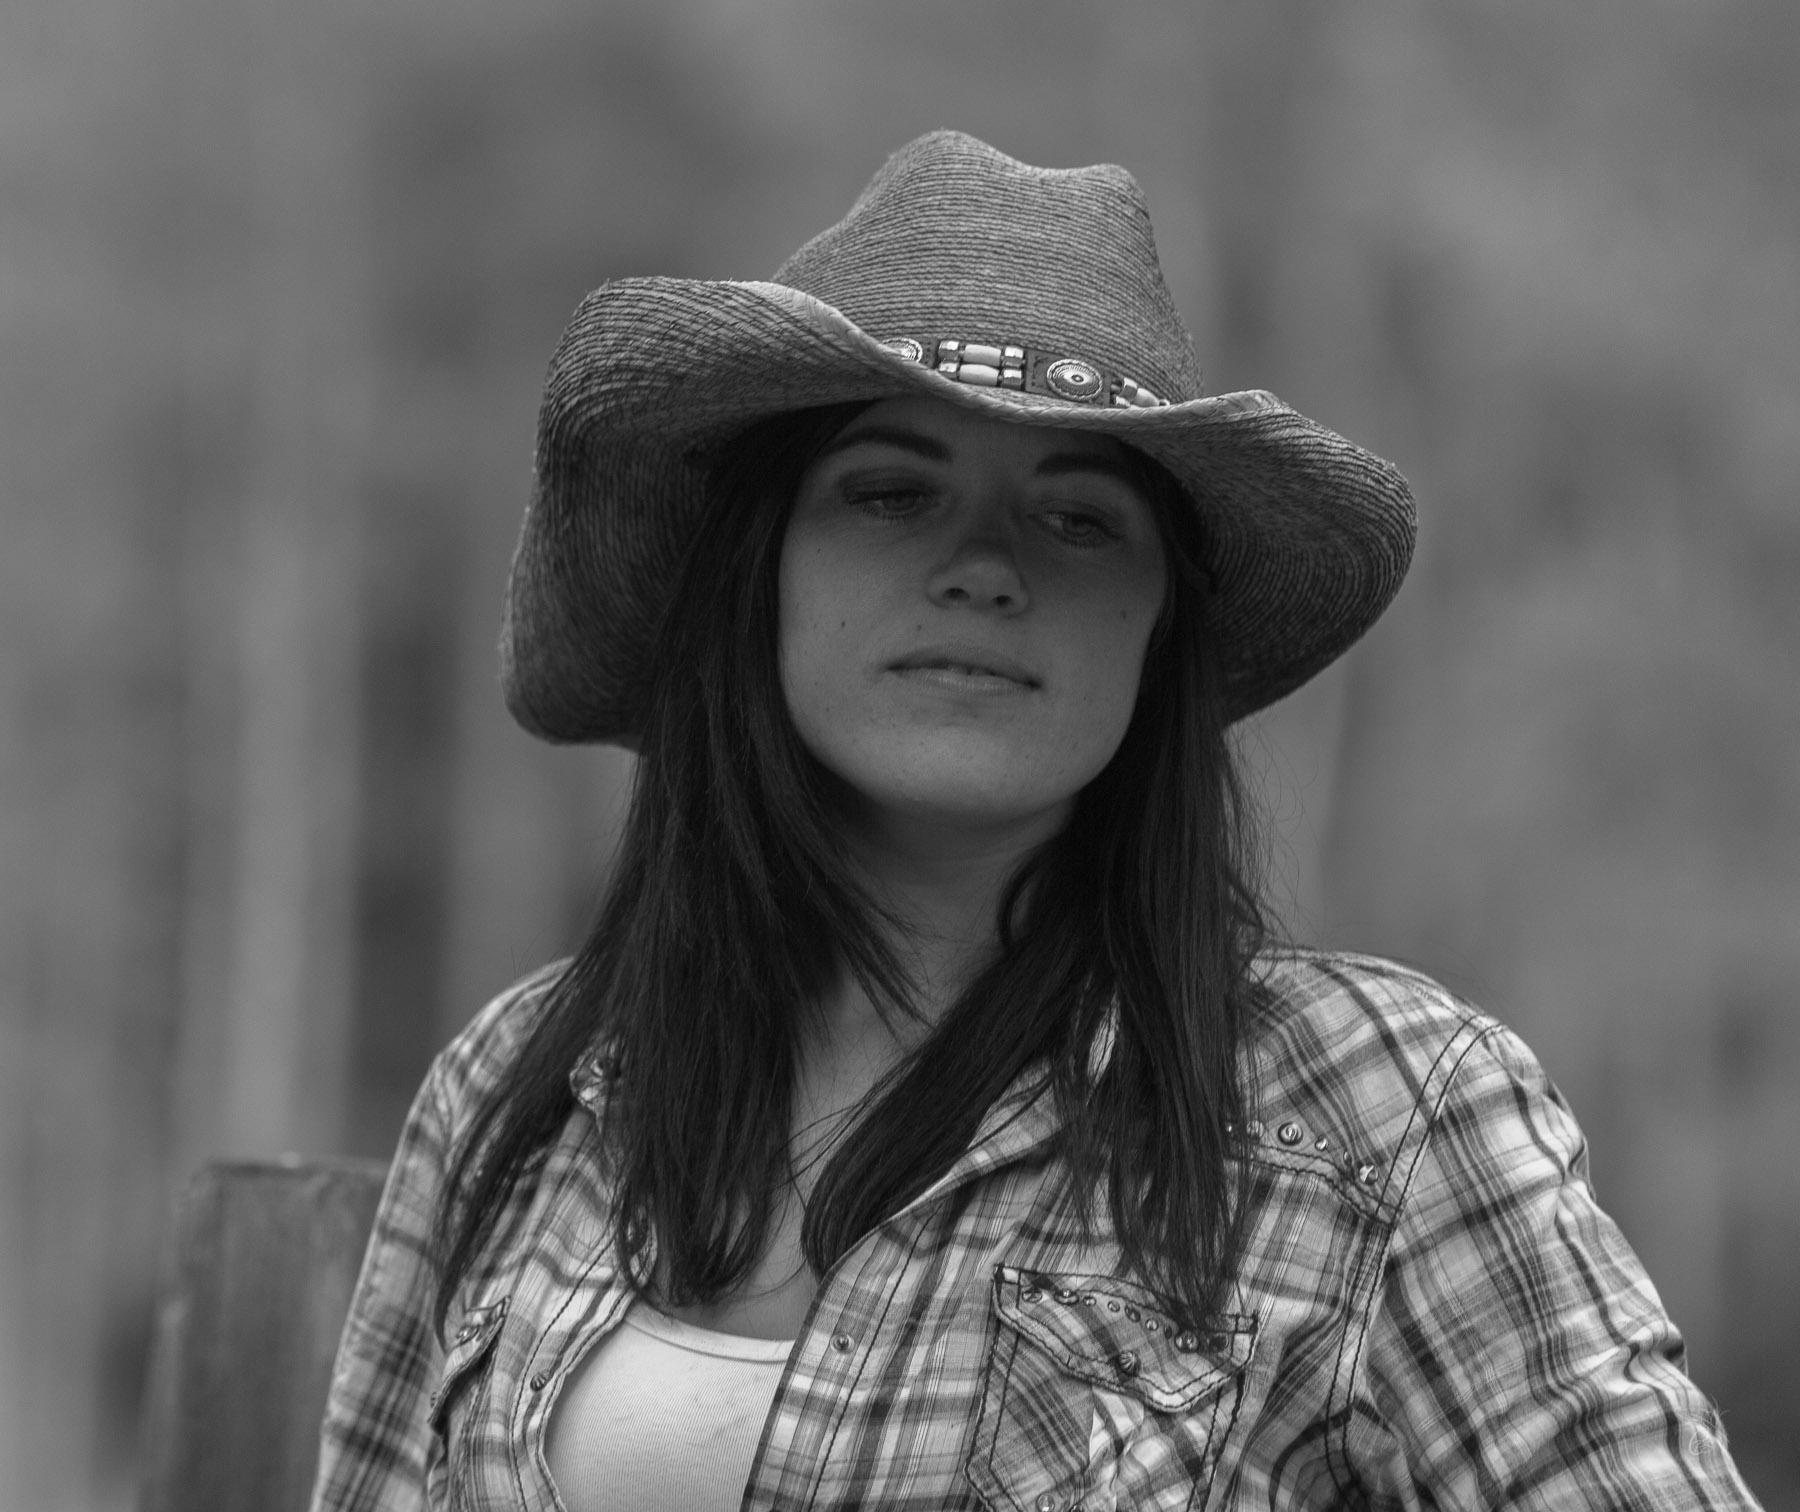 Cowgirl Pensive